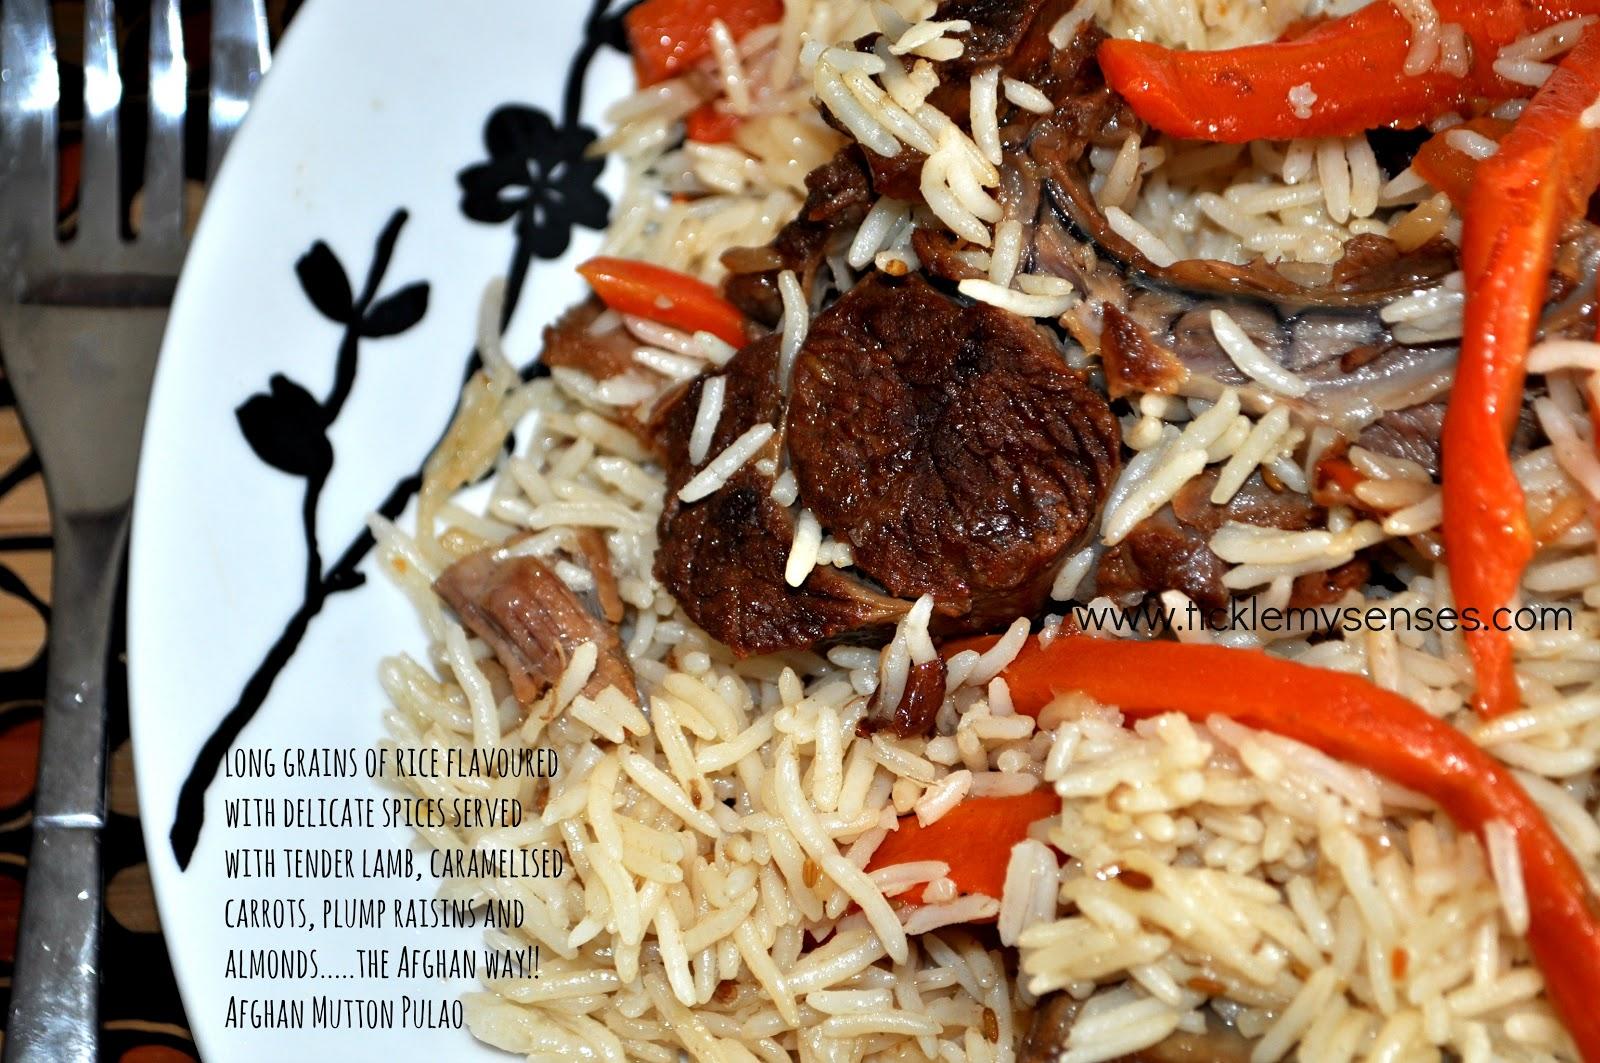 Authentic Afghan Food Near Jfk